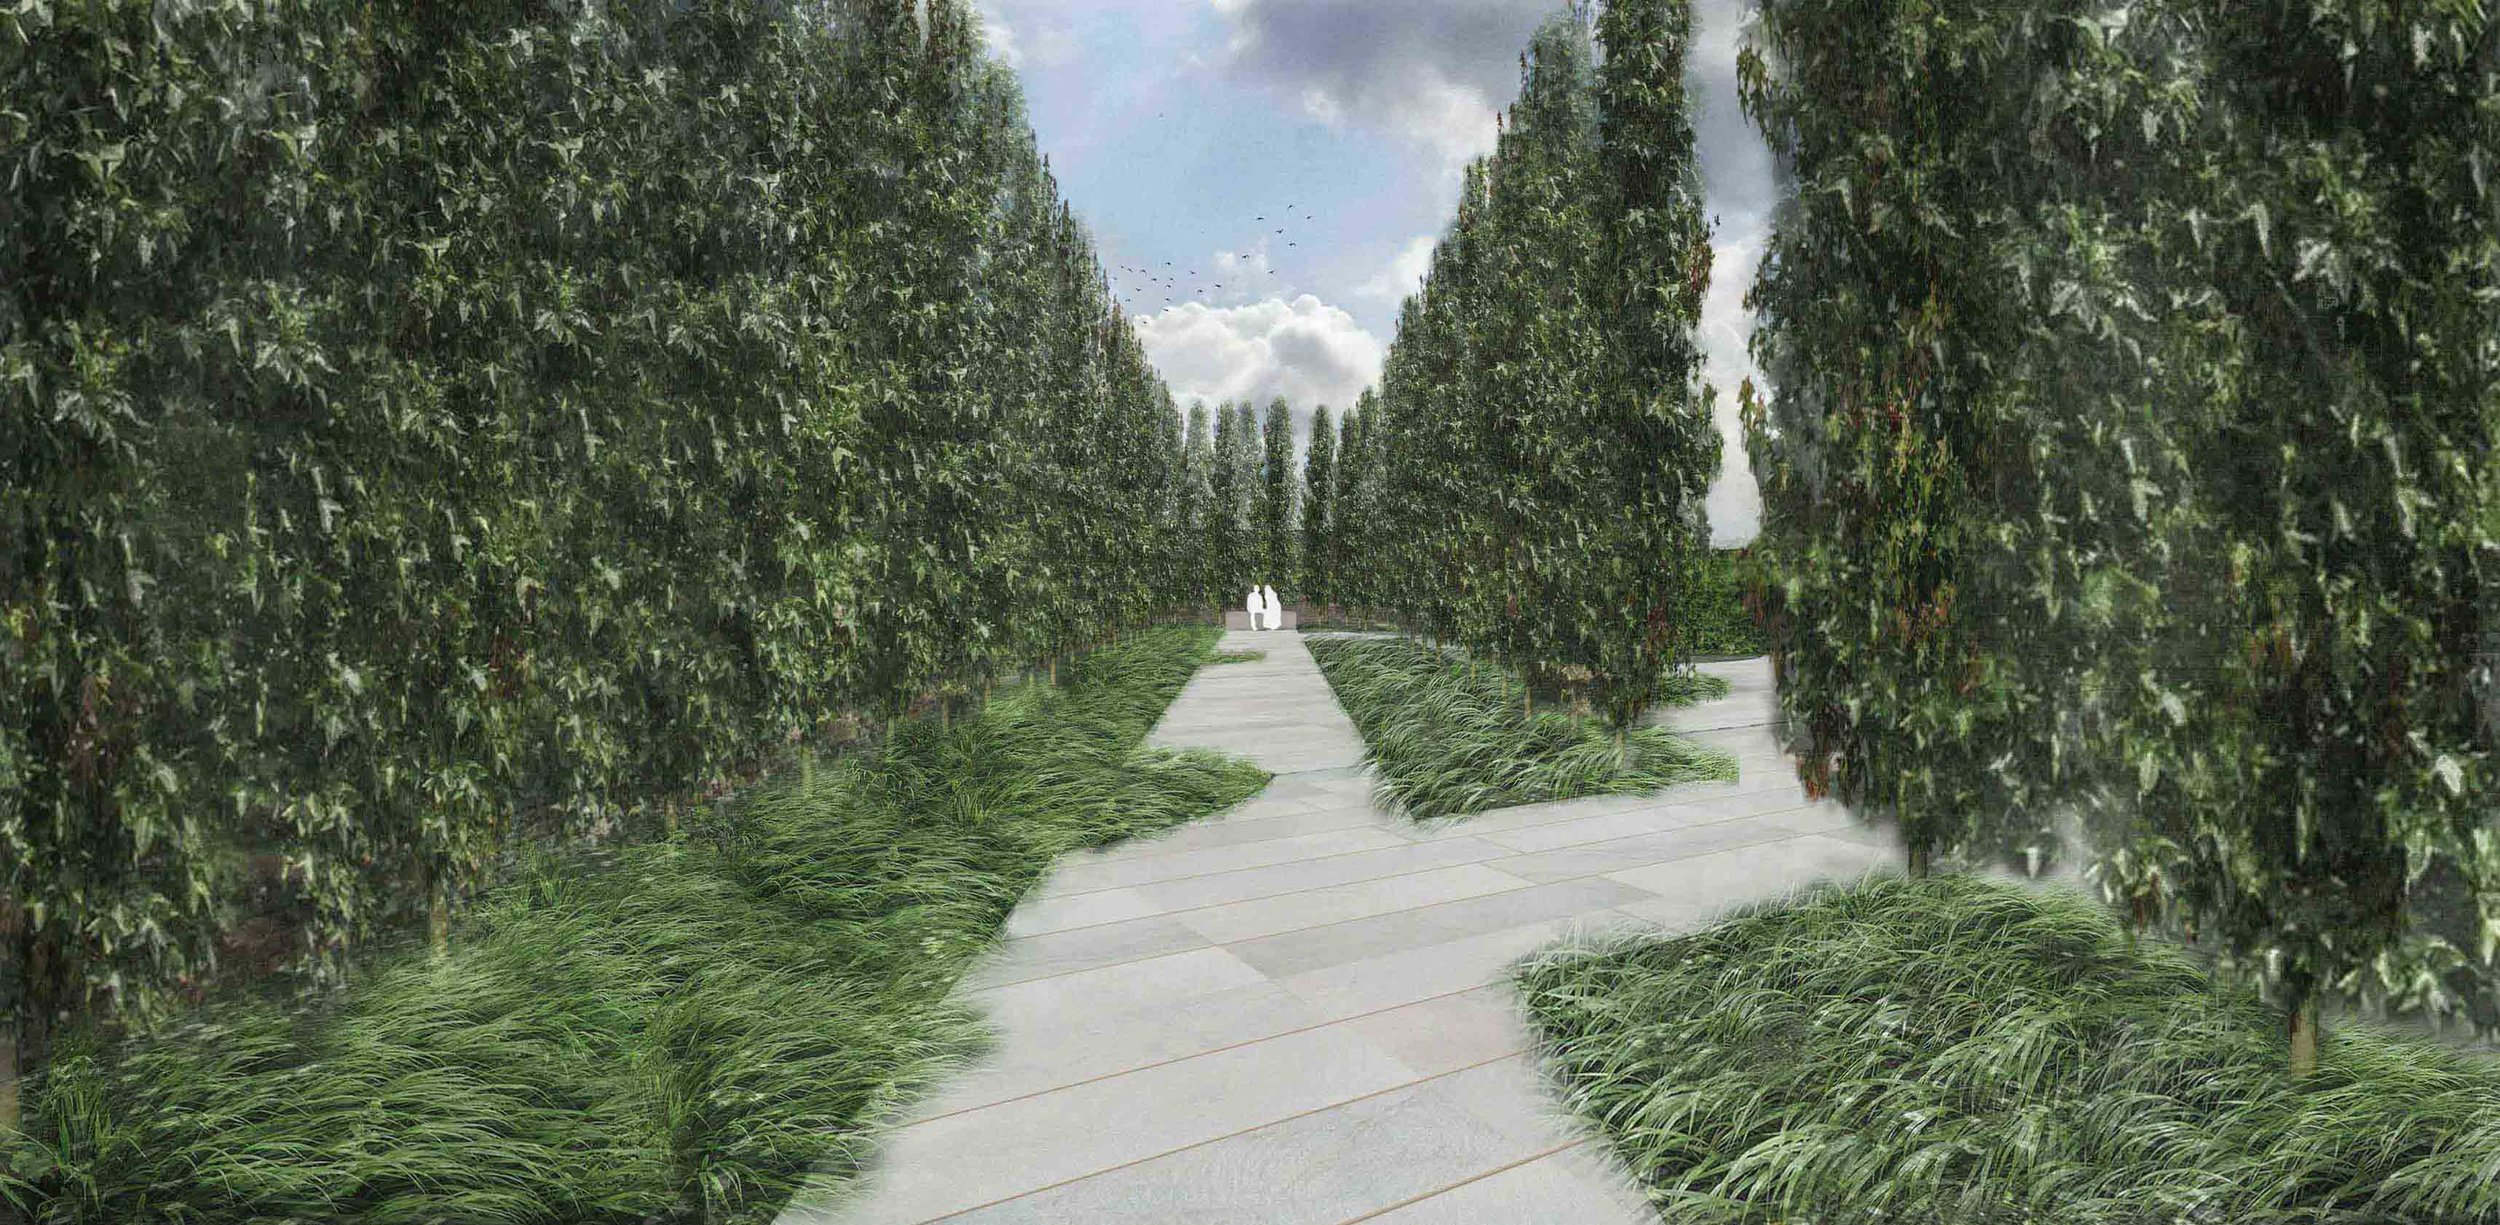 Liquidamber avenue of trees contemporary georgian garden design.jpg